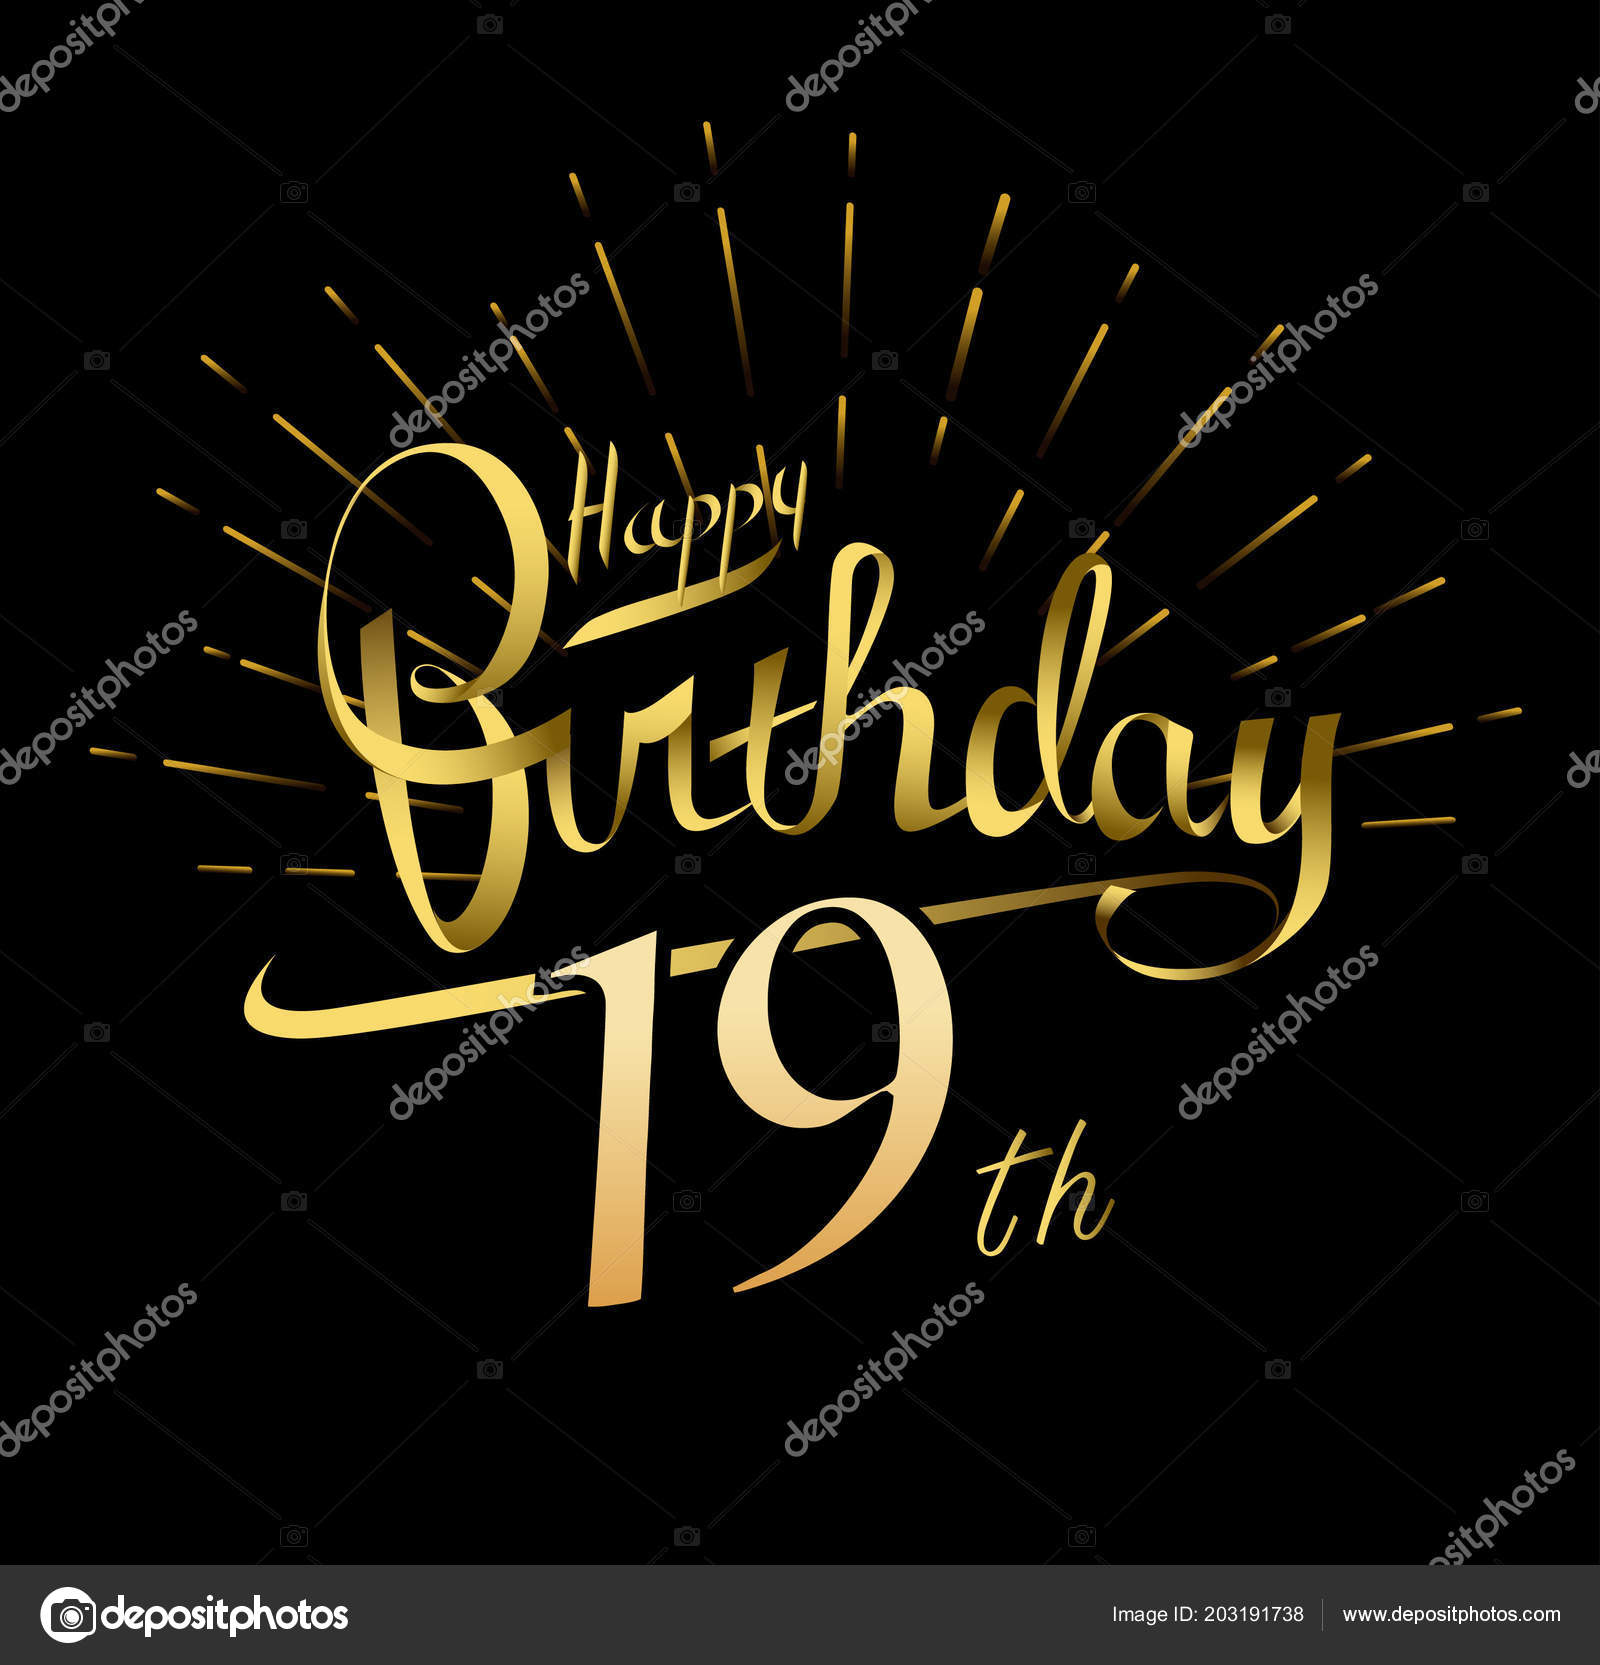 Happy birthday logo, decorative background– stock illustration